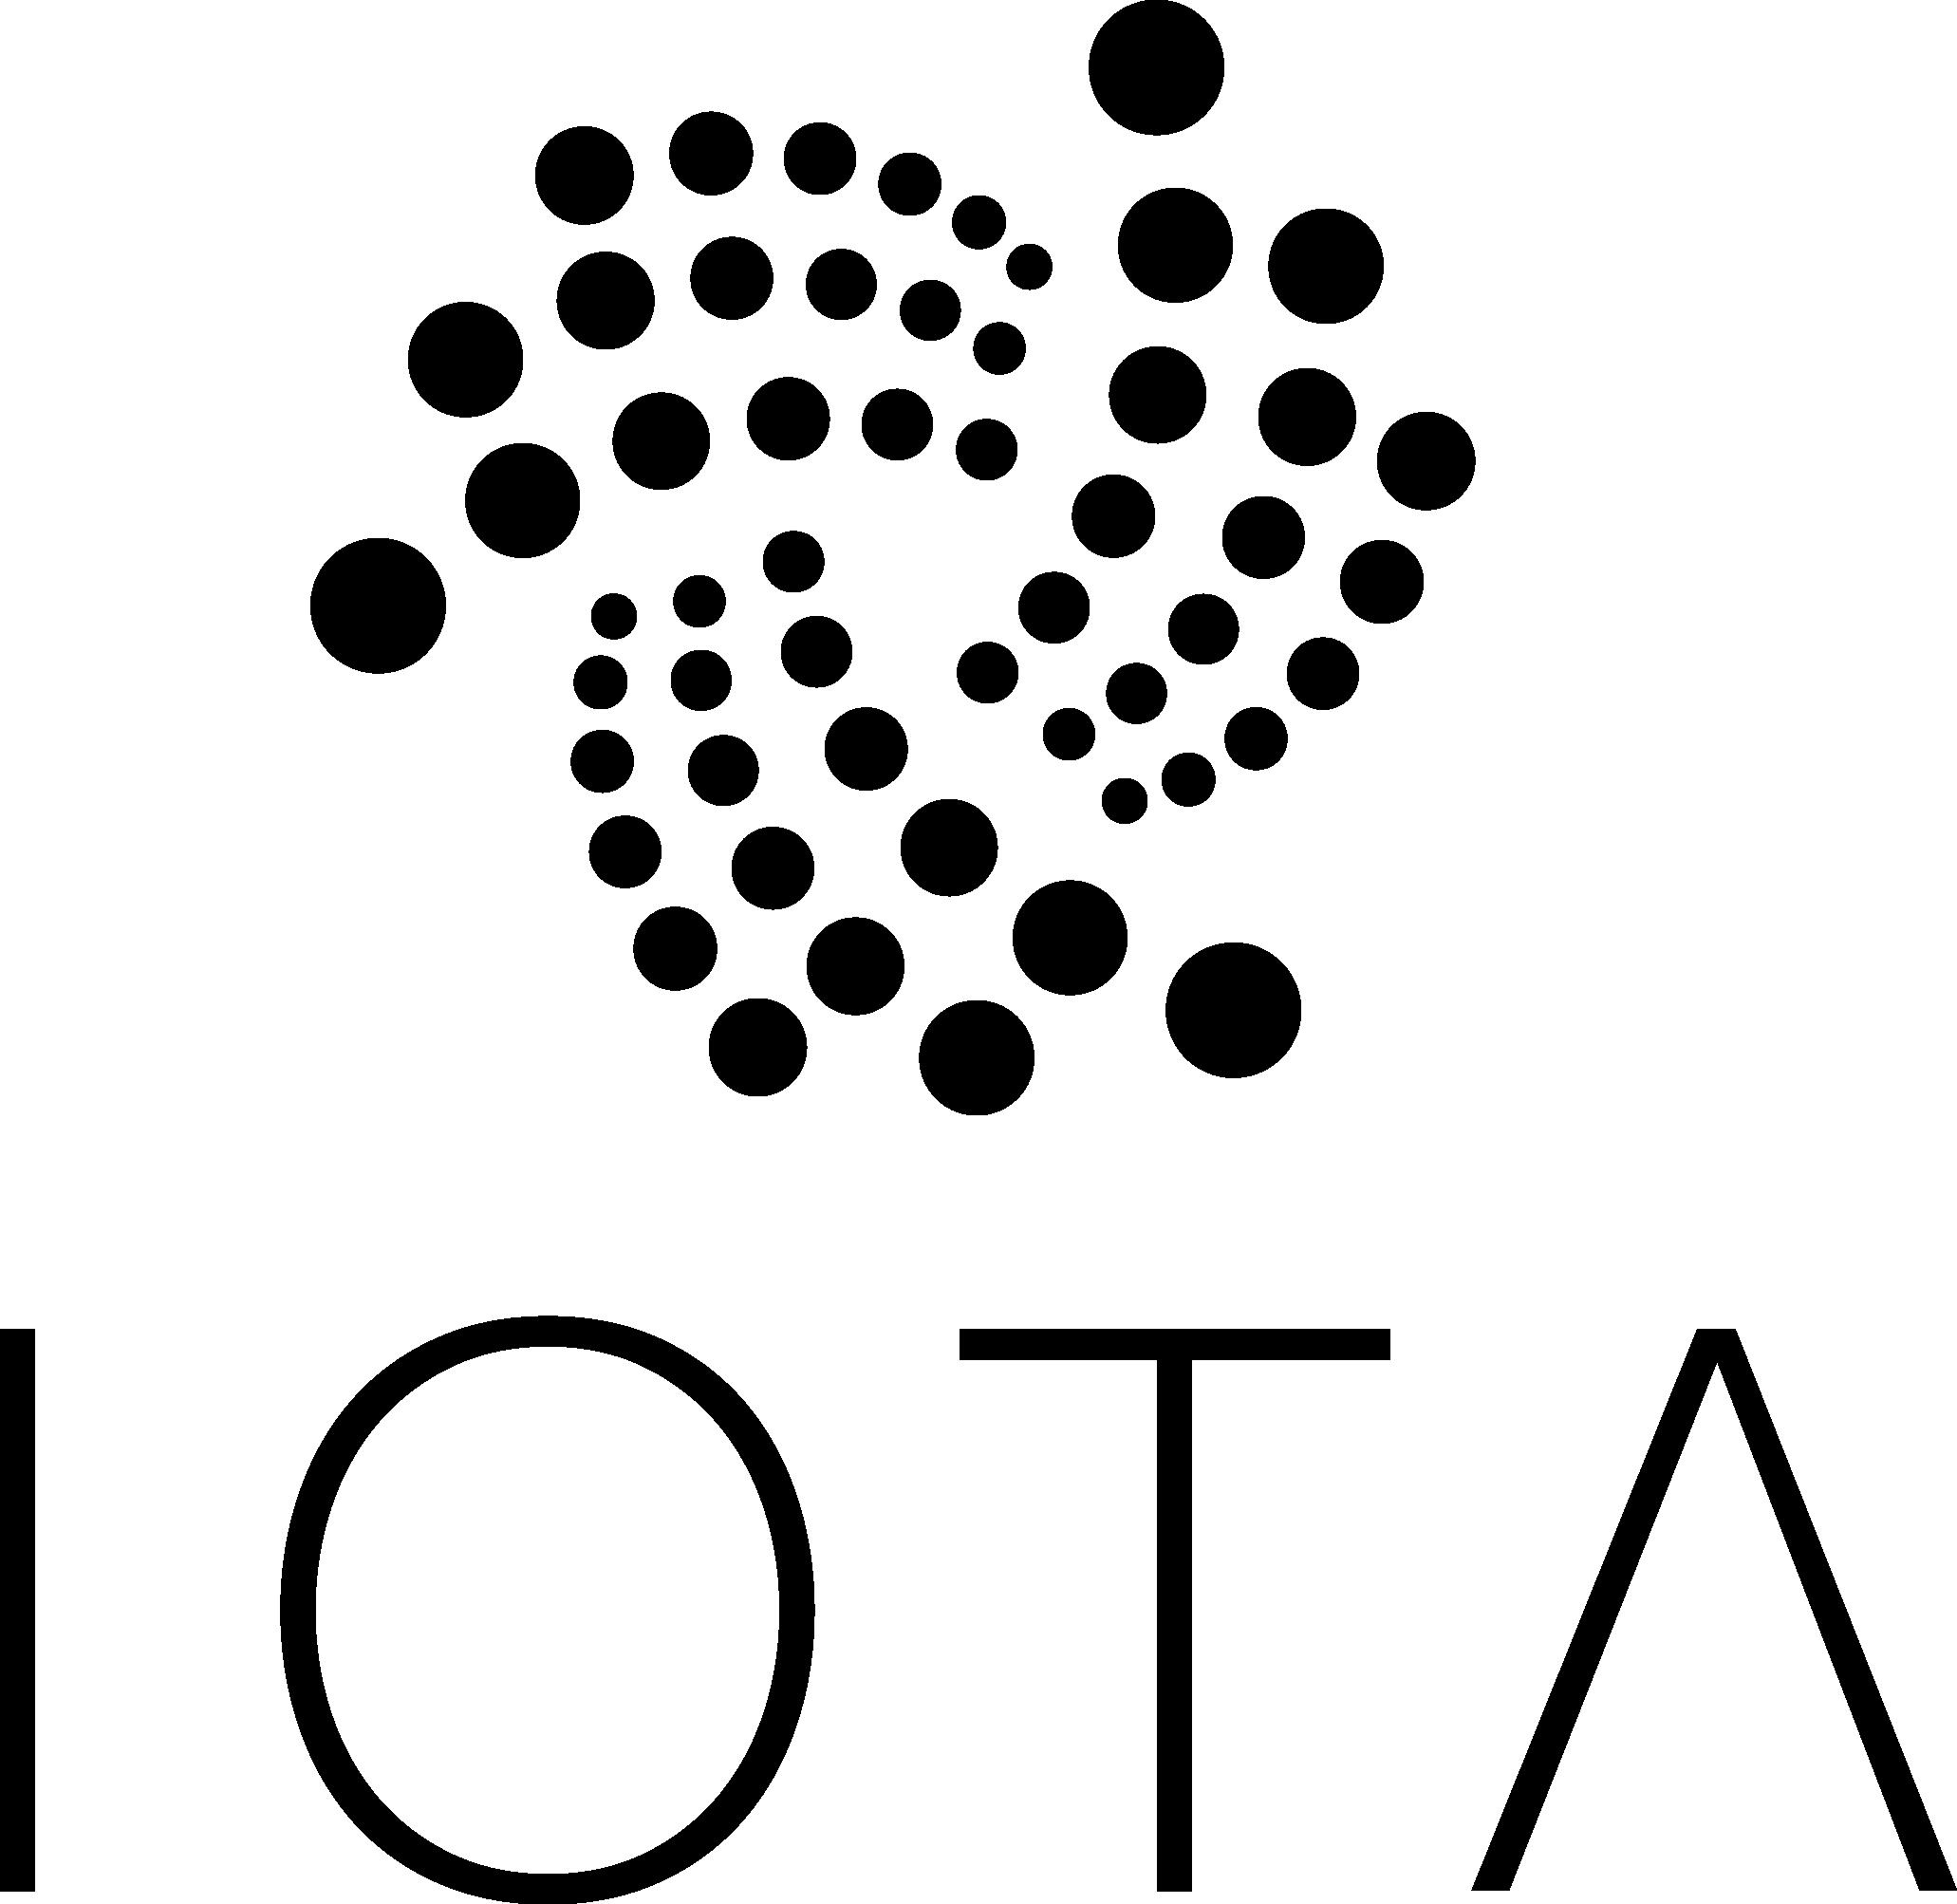 Iota Logo Poster Template Iota Download Vector